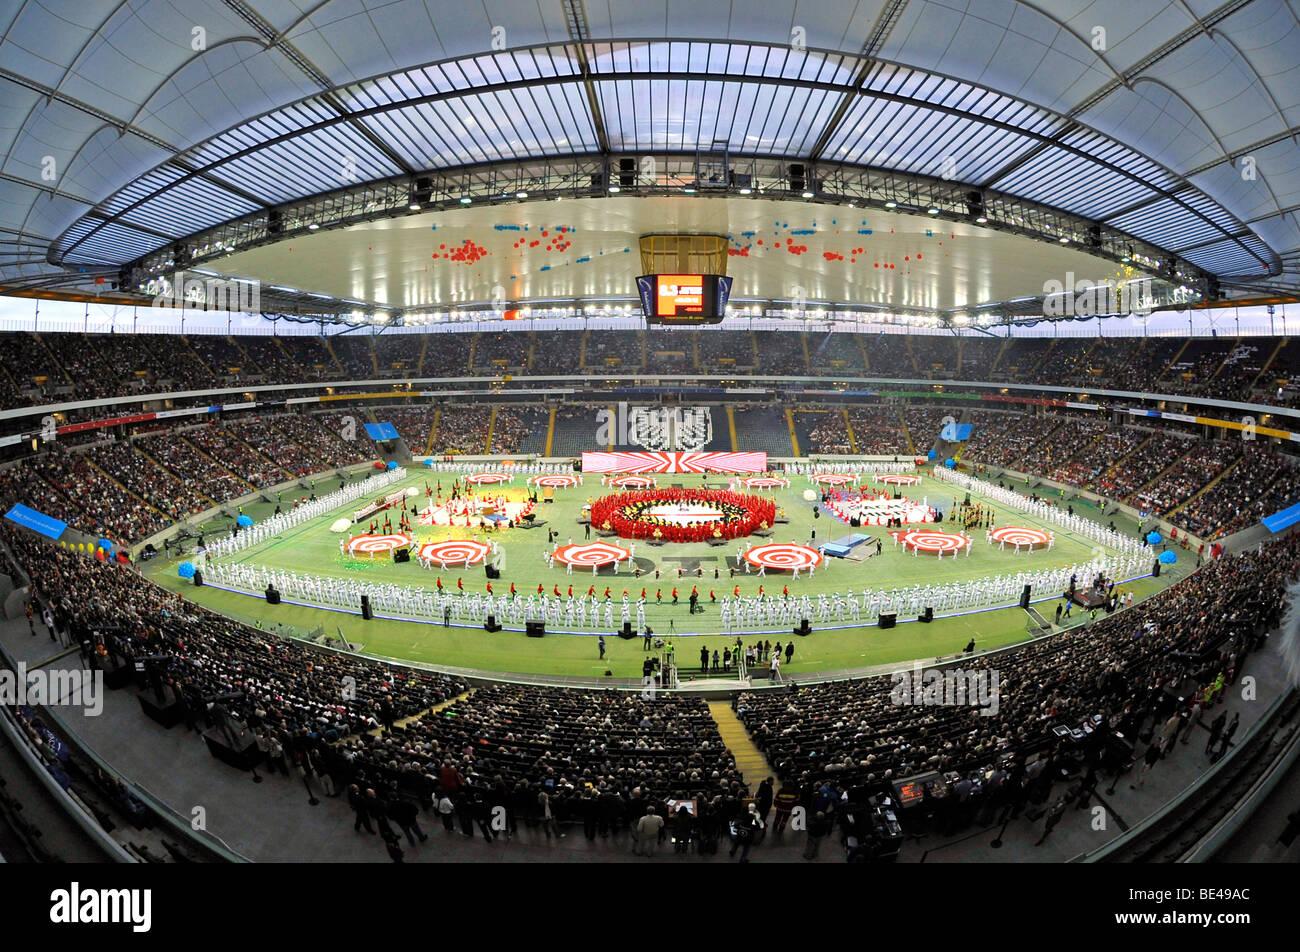 Stadium gala, Commerzbank Arena stadium, Internationales Deutsches Turnfest, International German Gymnastics Festival - Stock Image